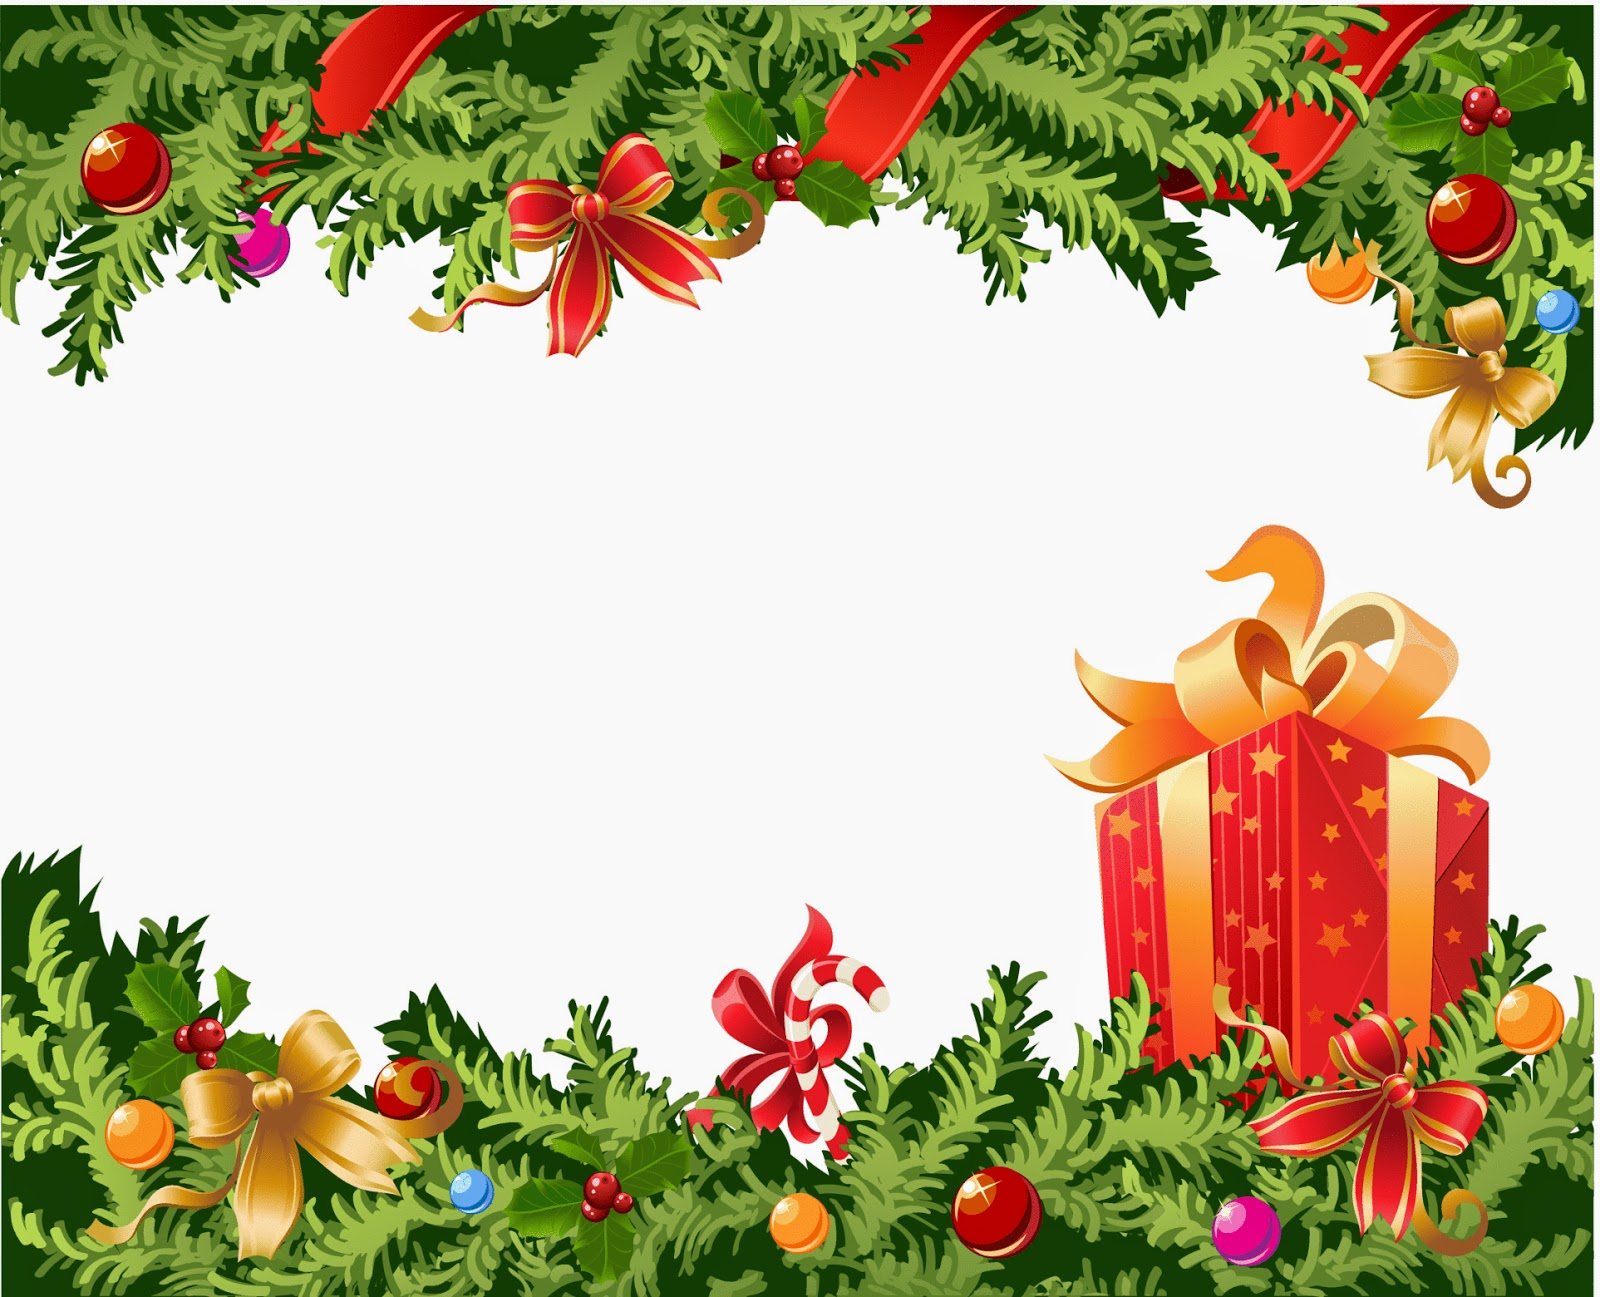 Adornos navide os para tarjetas o regalos tarjetas de for Adornos para paginas